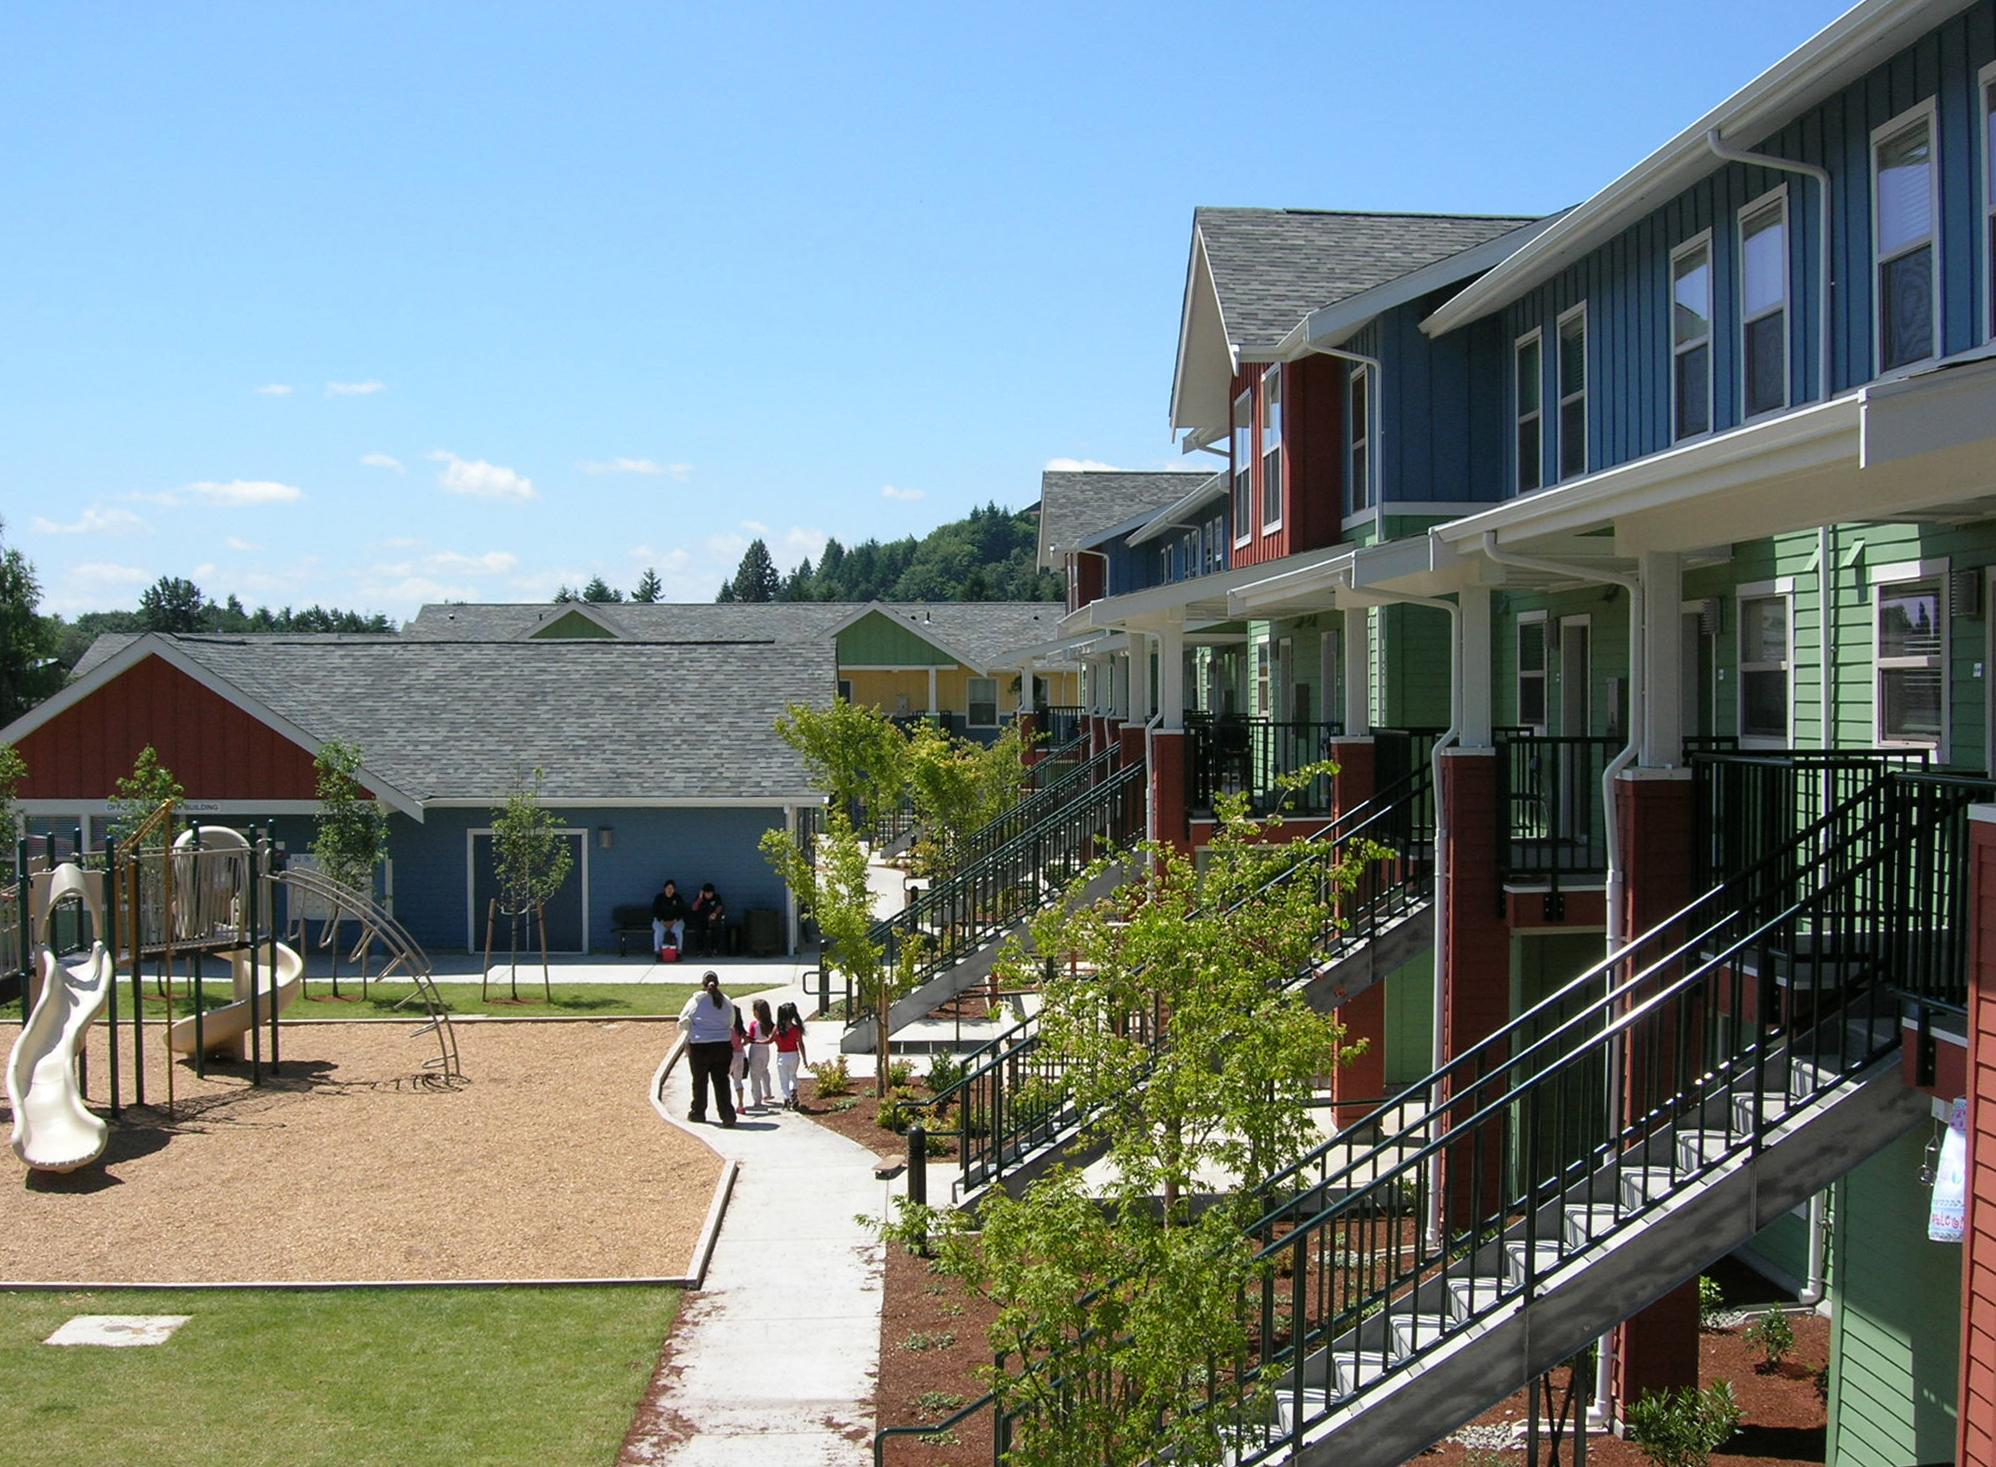 - Client: Catholic Housing Services of Western WashingtonLocation: Centralia, WashingtonCompletion: 2005Project Size: 46 Units, 48,290 SF